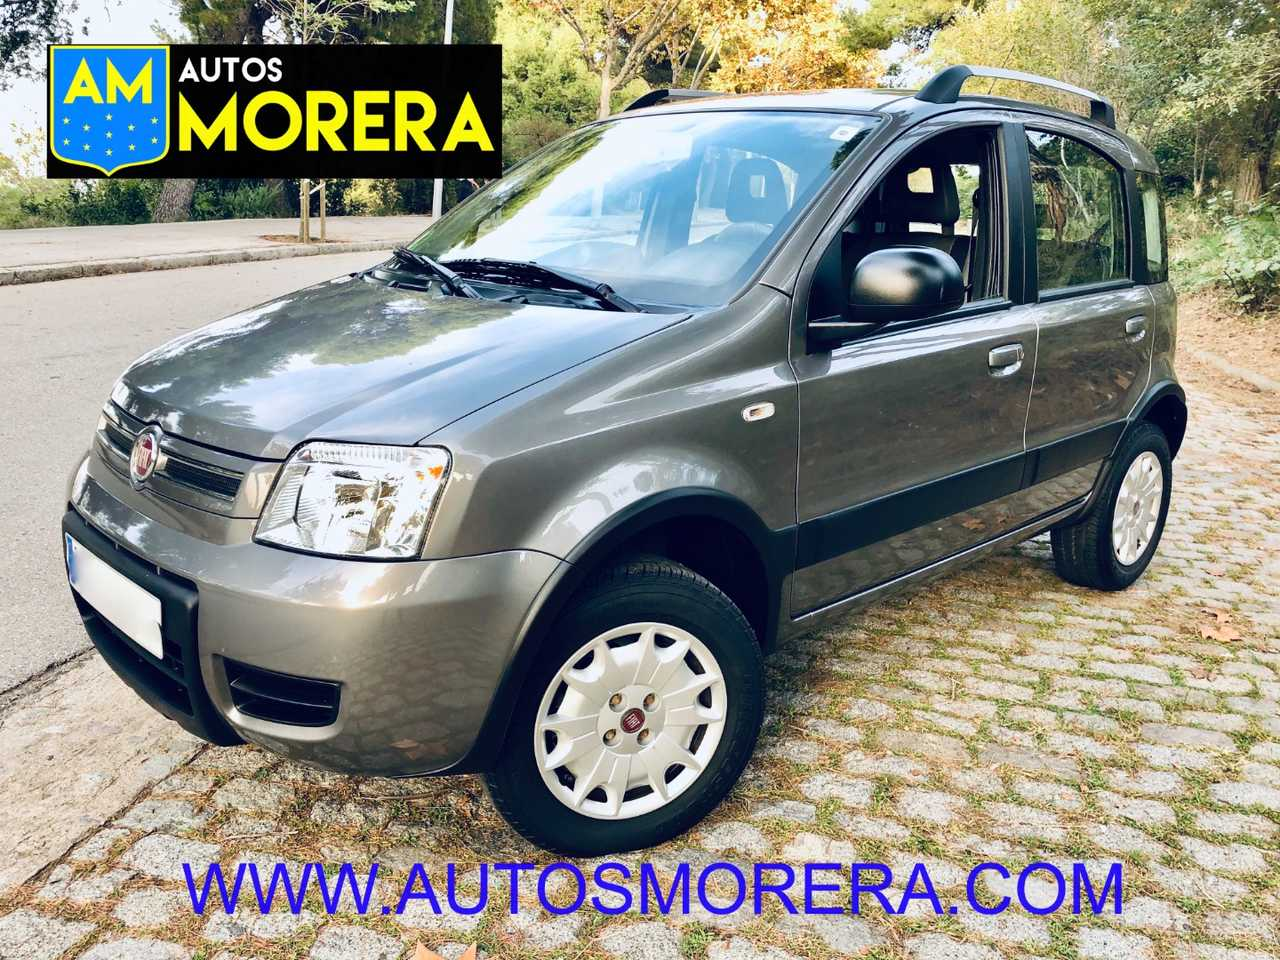 Fiat Panda 4x4 Climbing 4x4. Poco uso. Pocos KM. Oportunidad!!!   - Foto 1